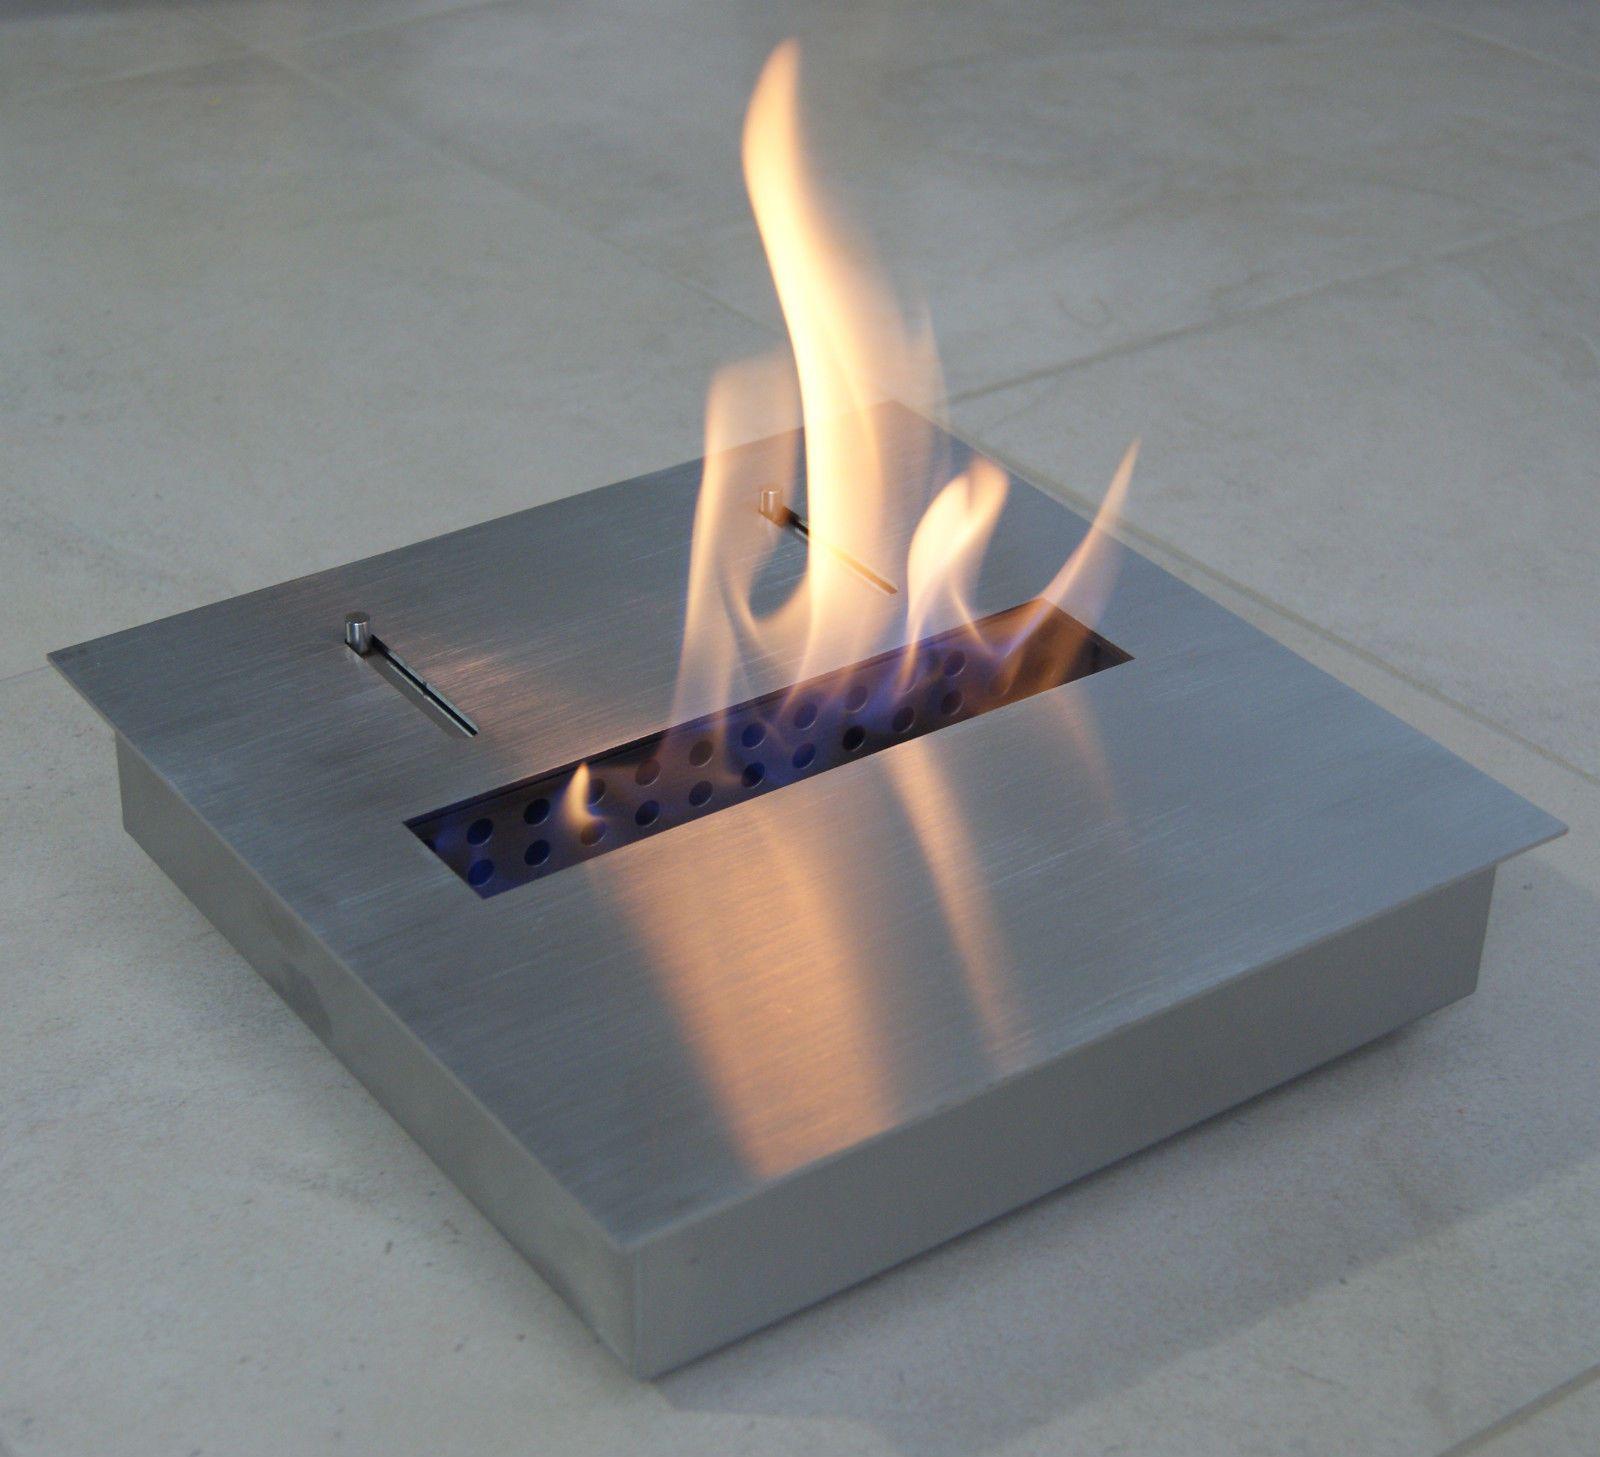 Bio Ethanol Or Gel Fuel Fireplace Firebox Insert Burner